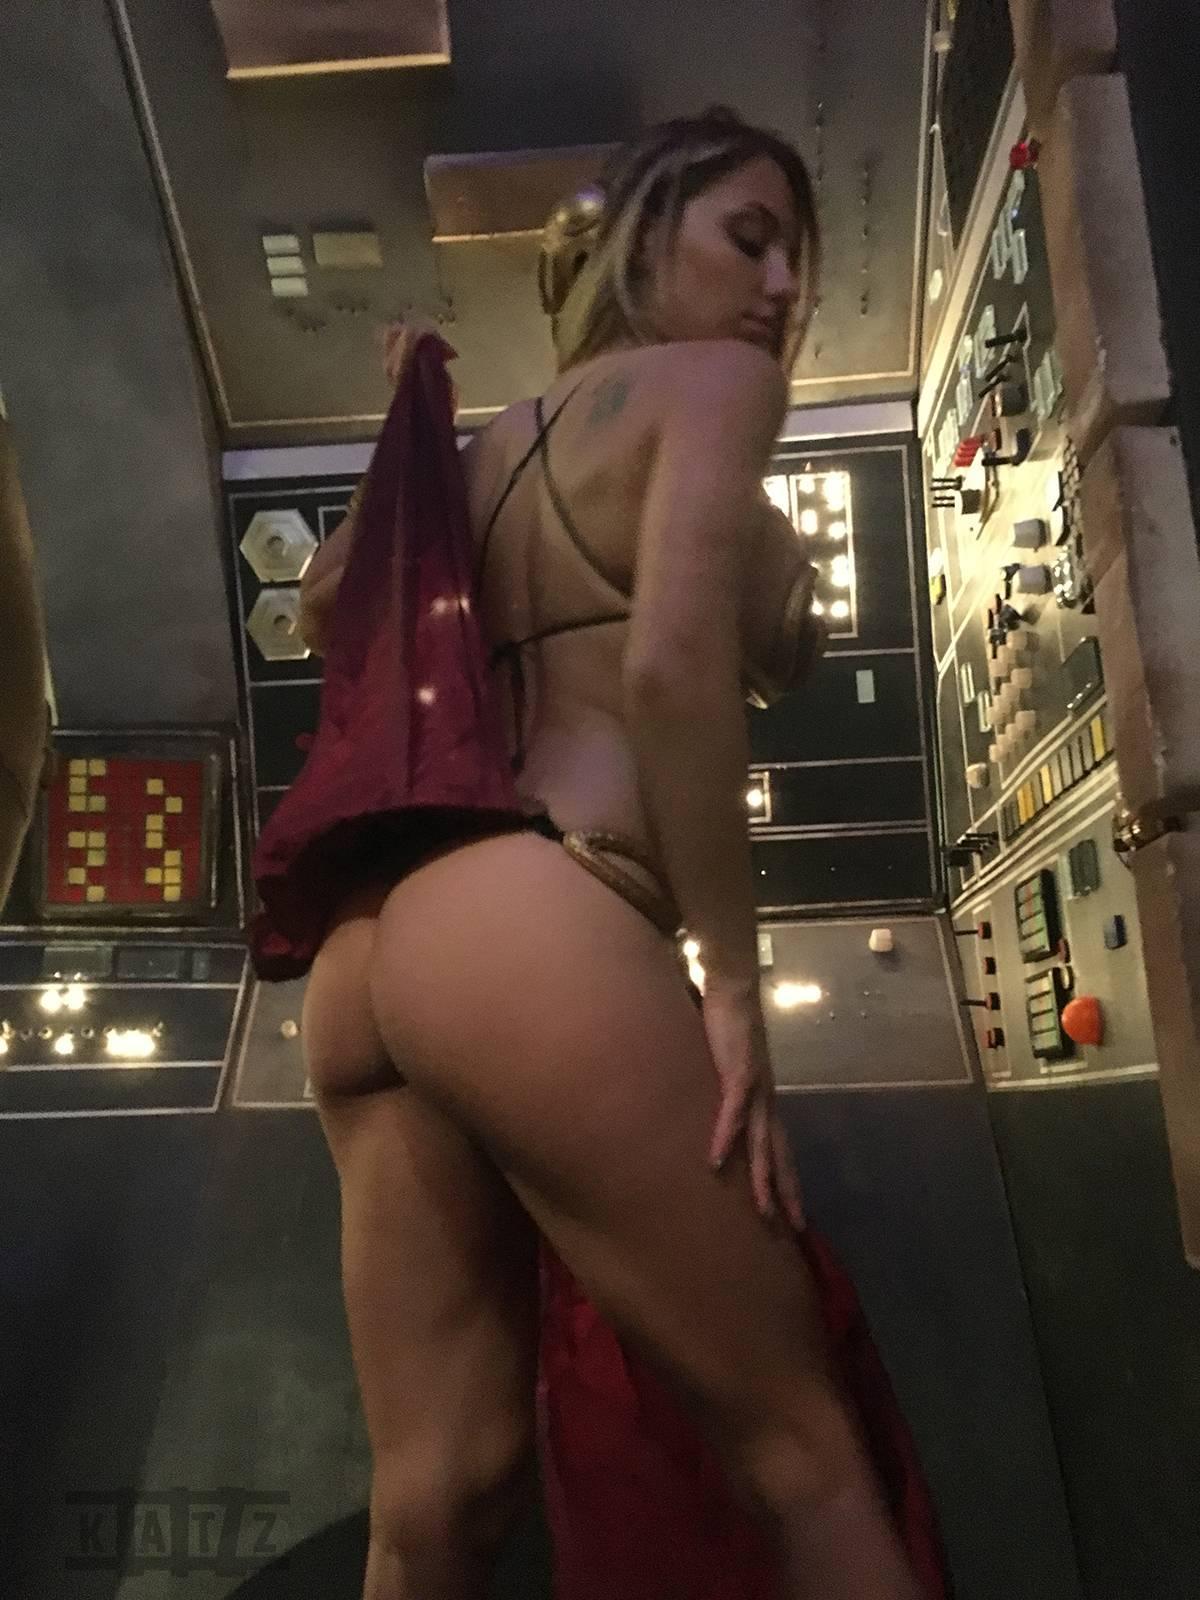 Liz Katz Slave Leia Nude Cosplay Onlyfans Leaked Photos 24